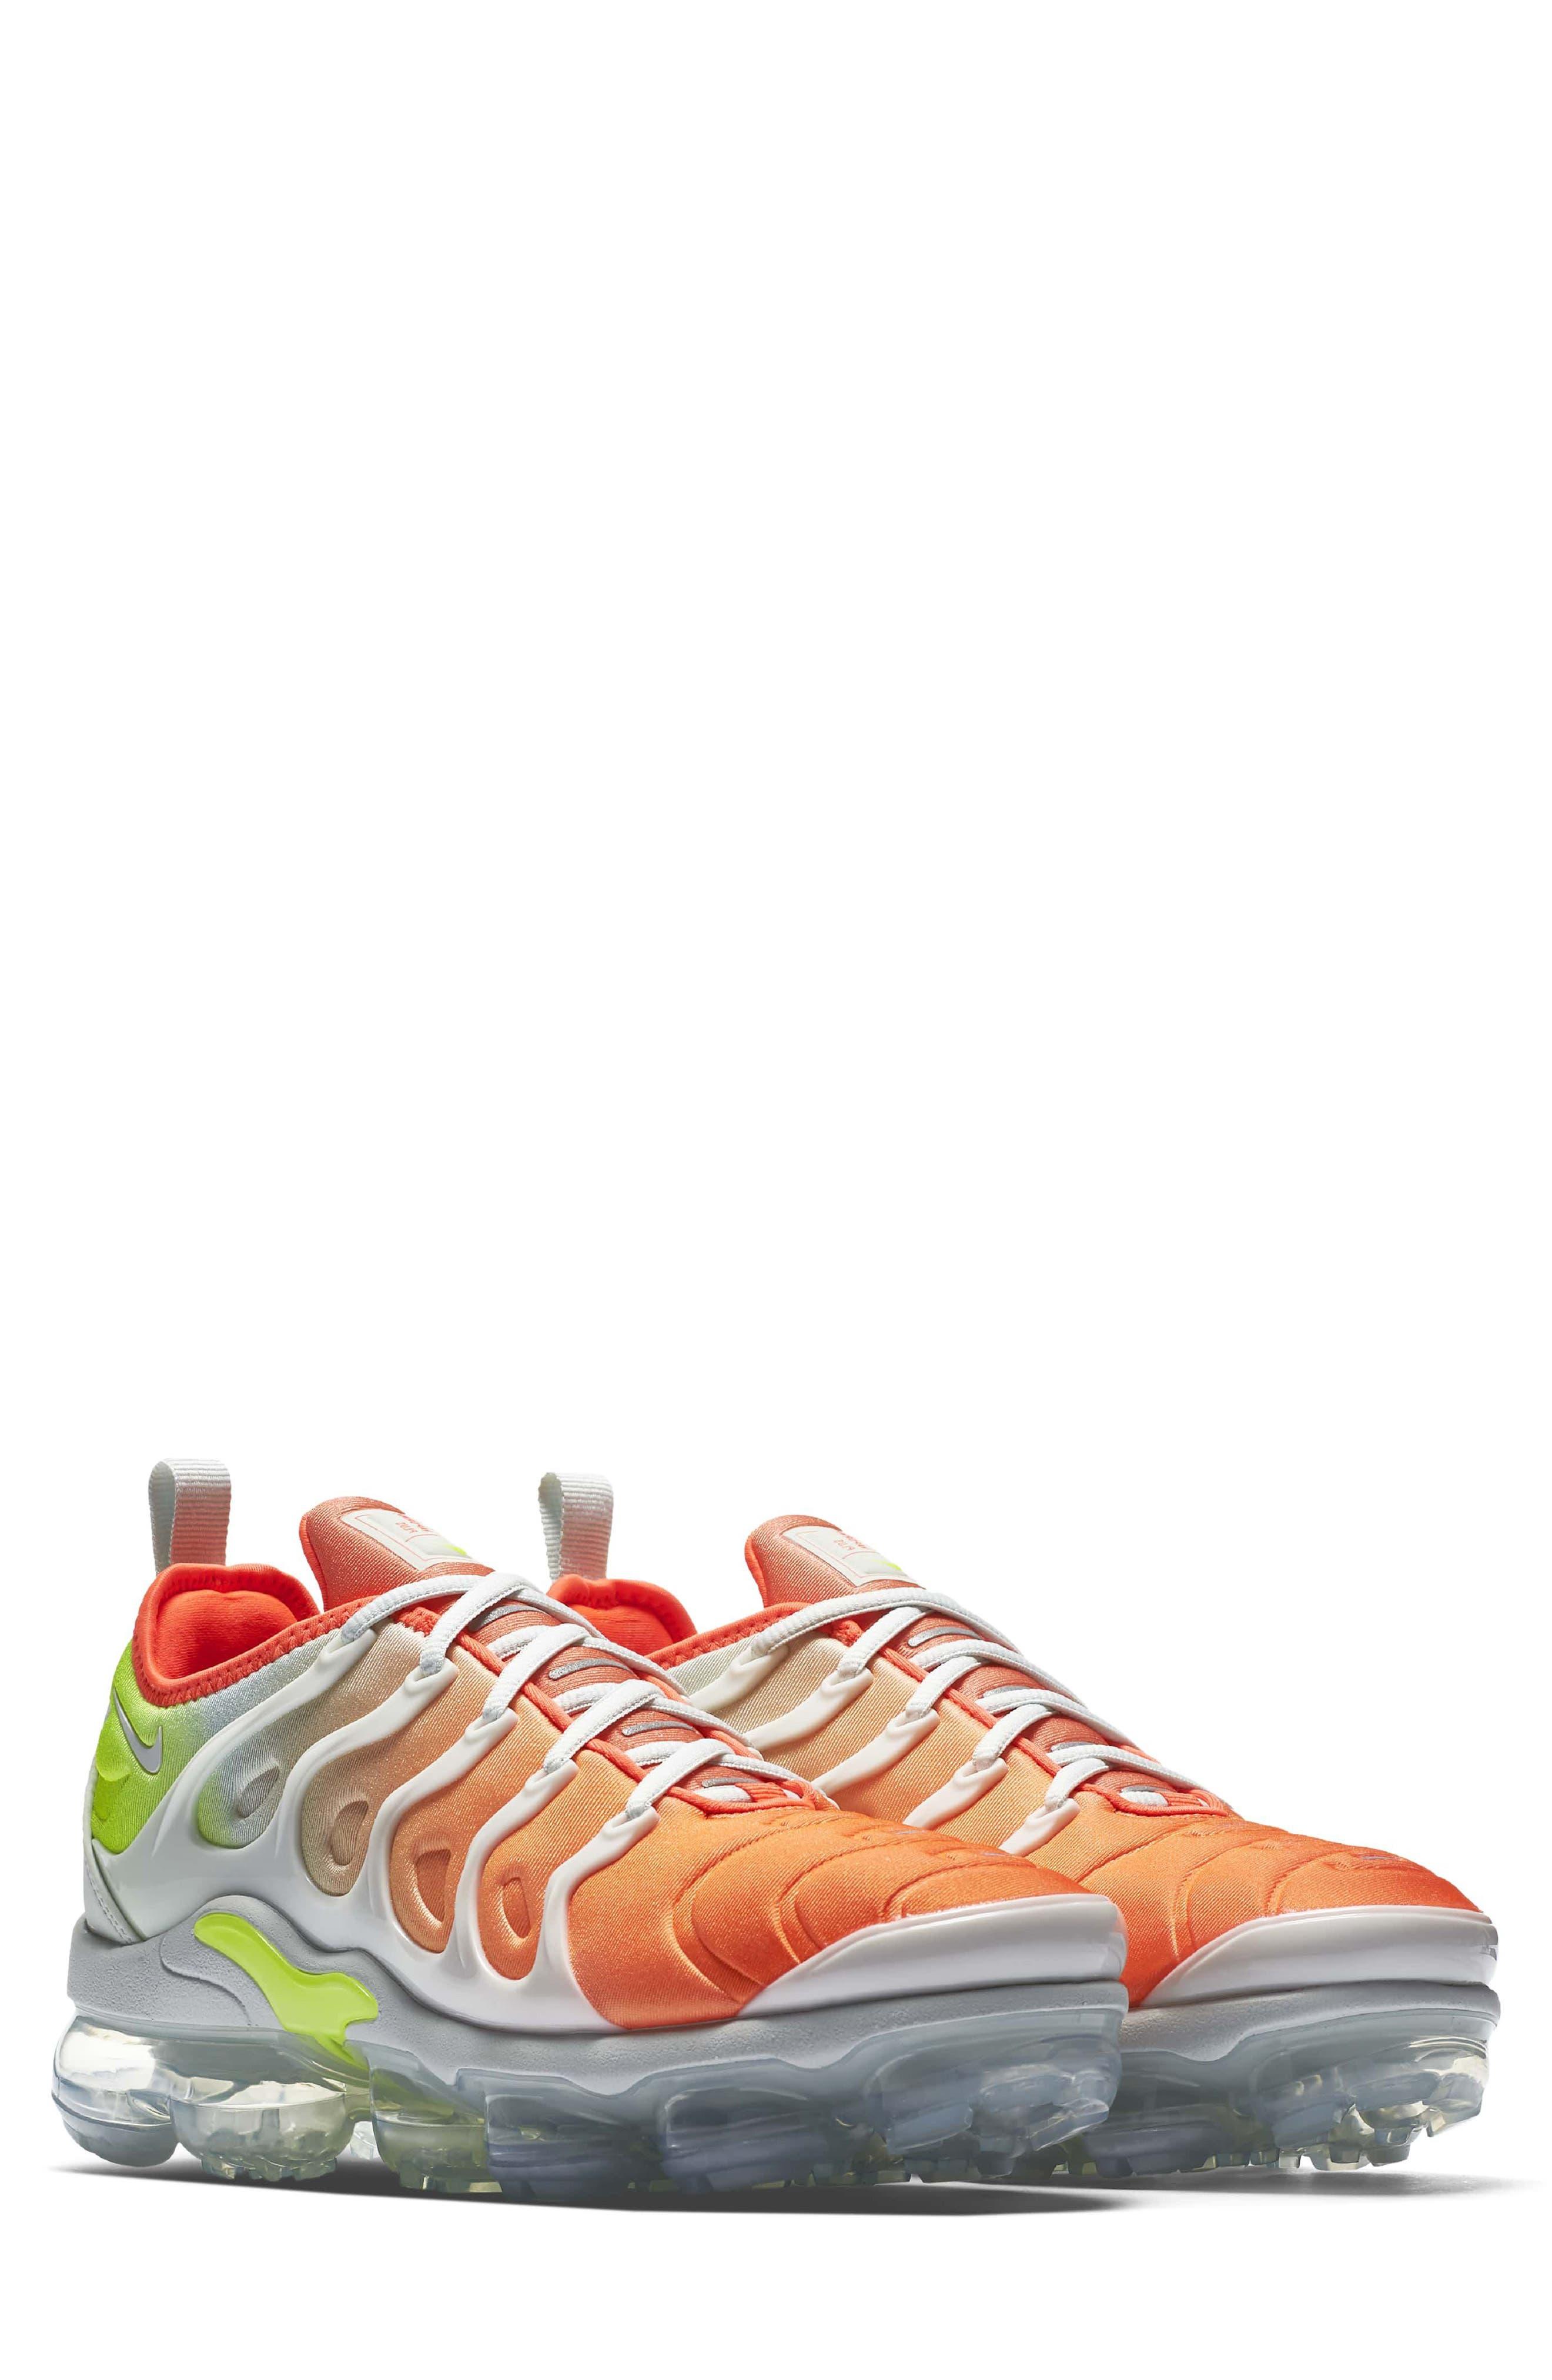 Nike Air VaporMax Plus (Women)